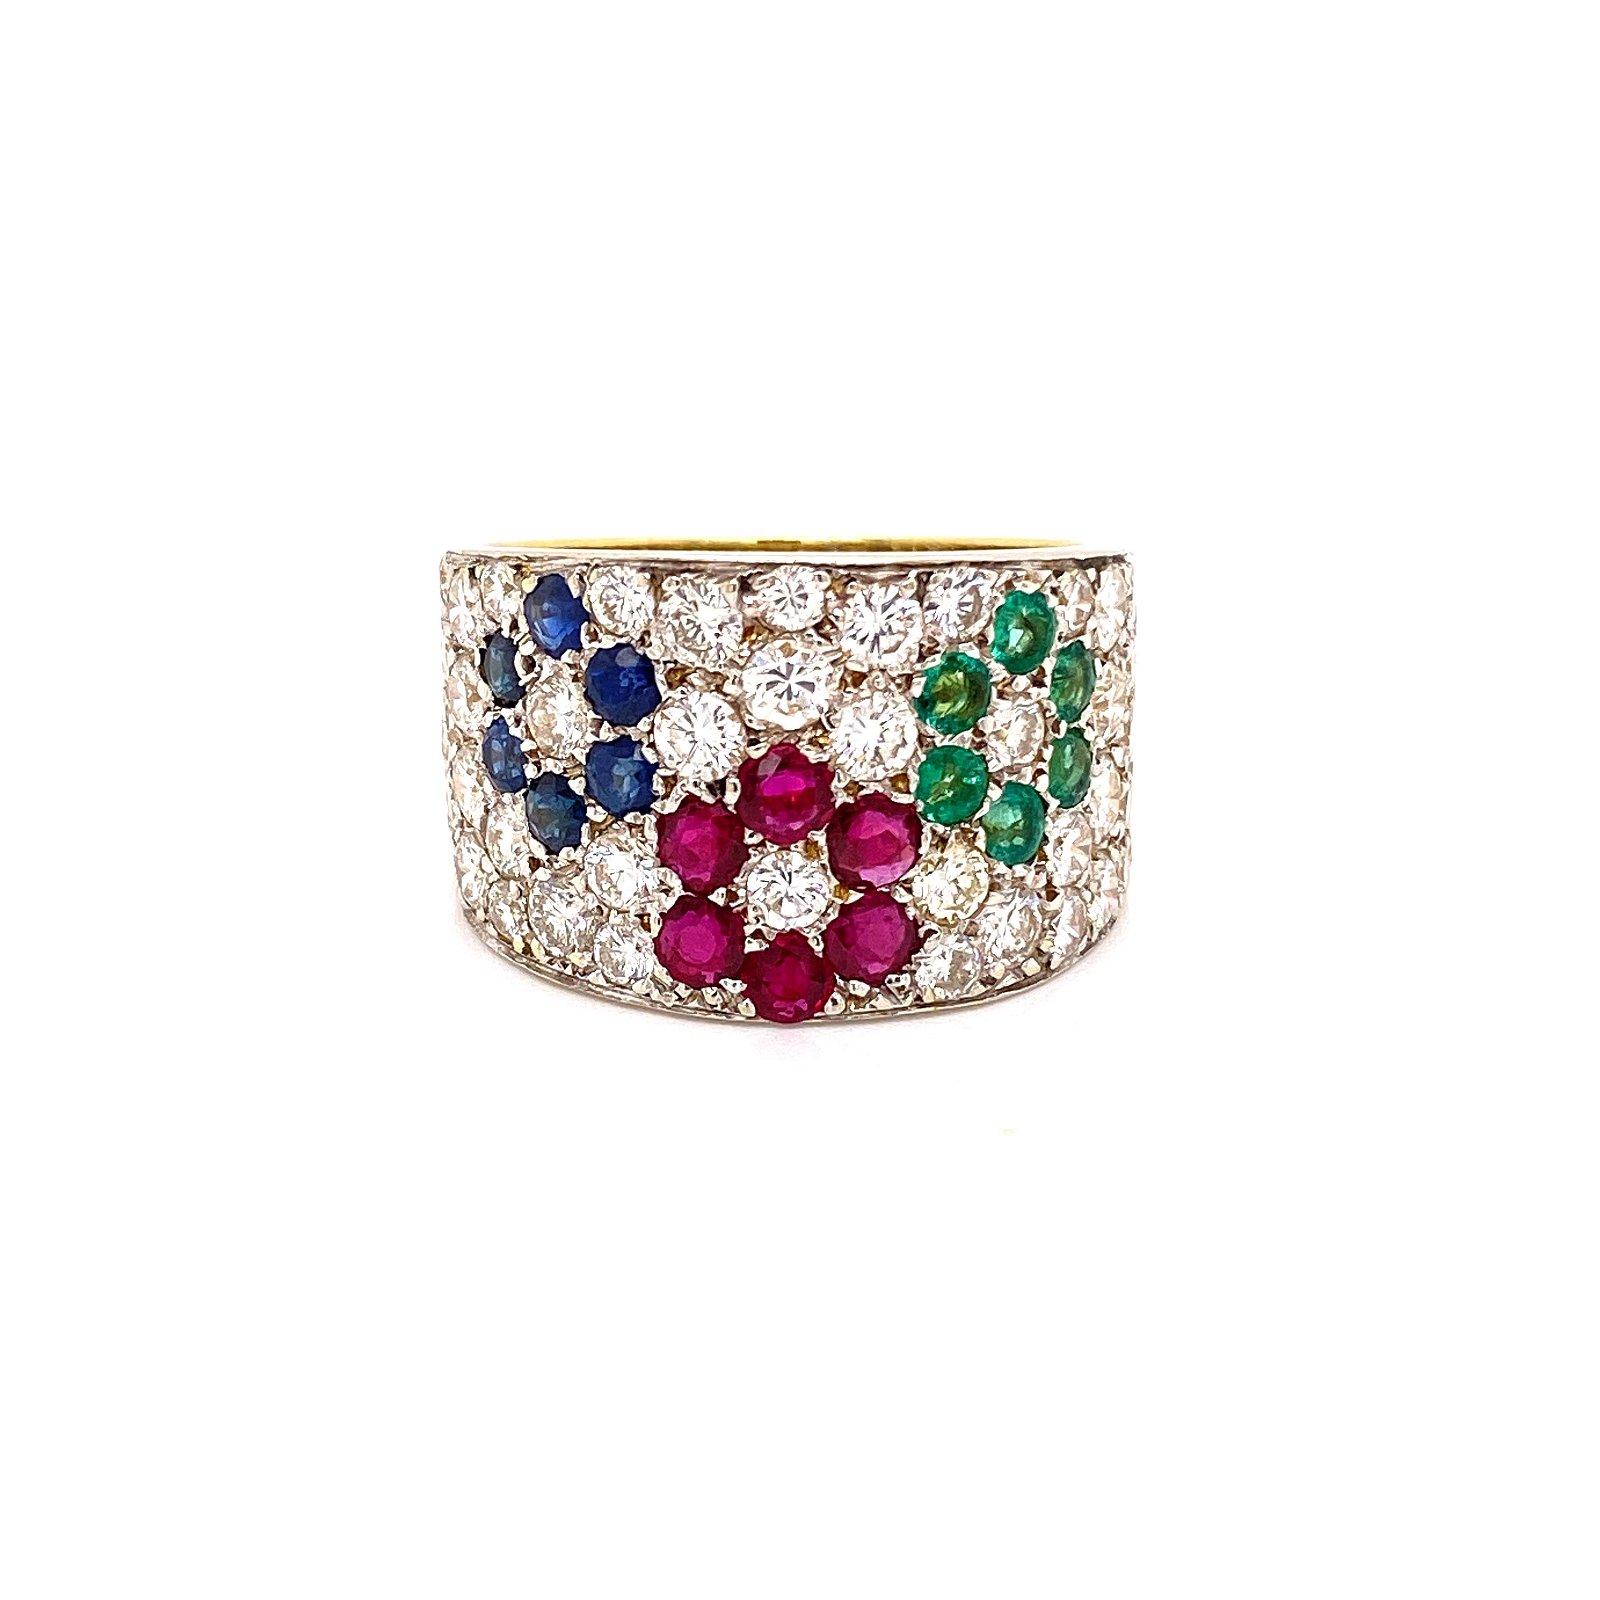 18k Gold, Colored Gems & Diamonds Ring